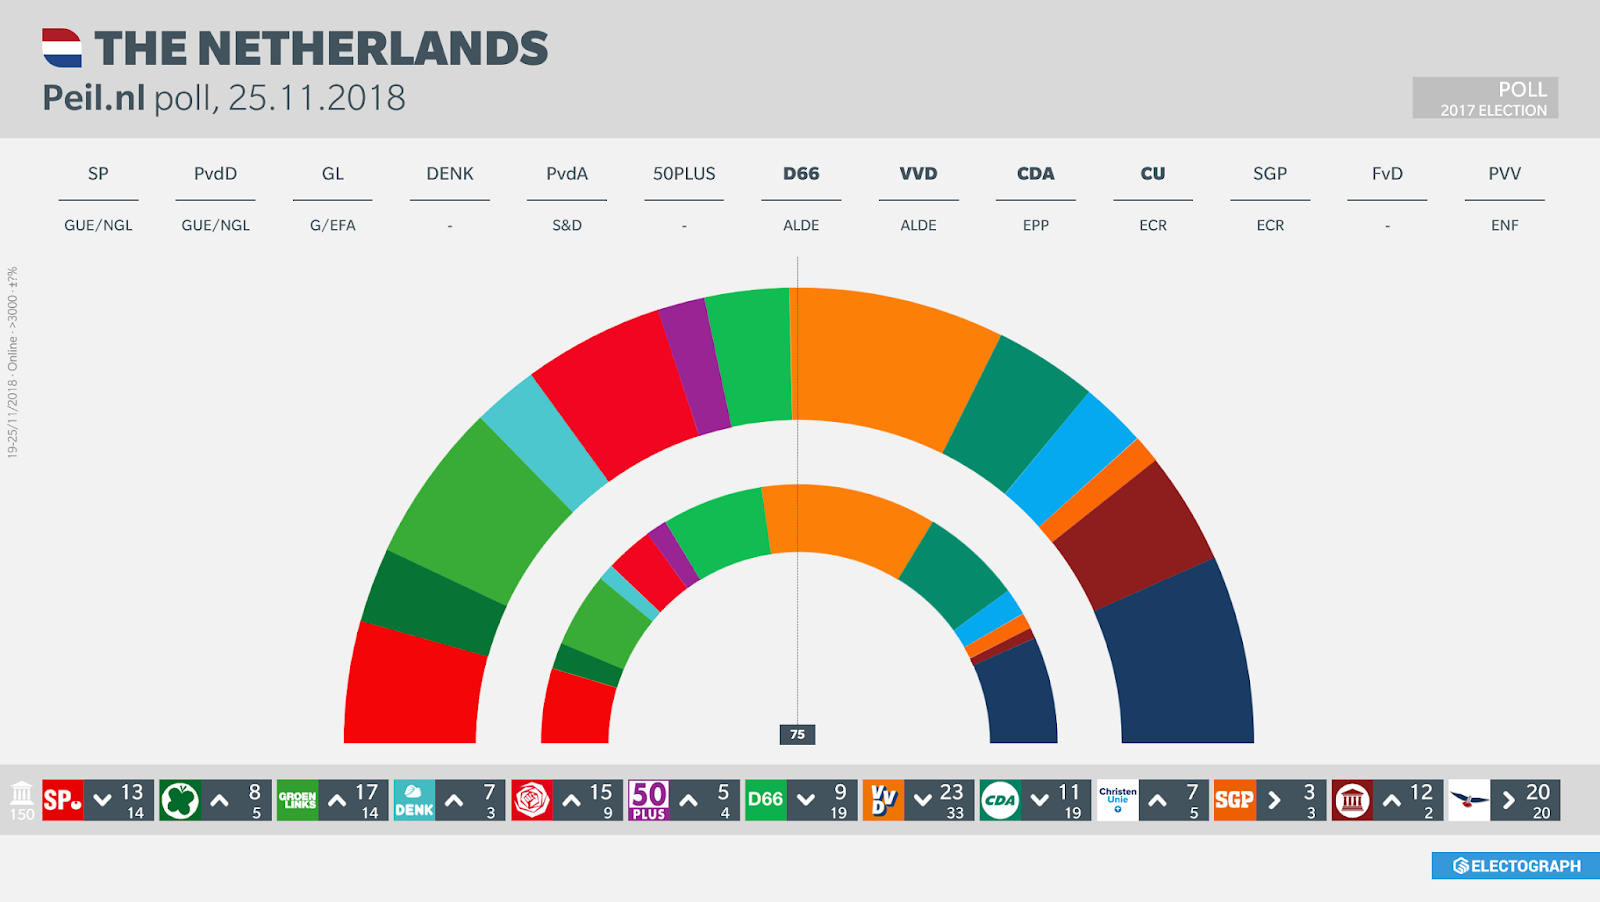 THE NETHERLANDS: Peil.nl poll chart, 25 November 2018